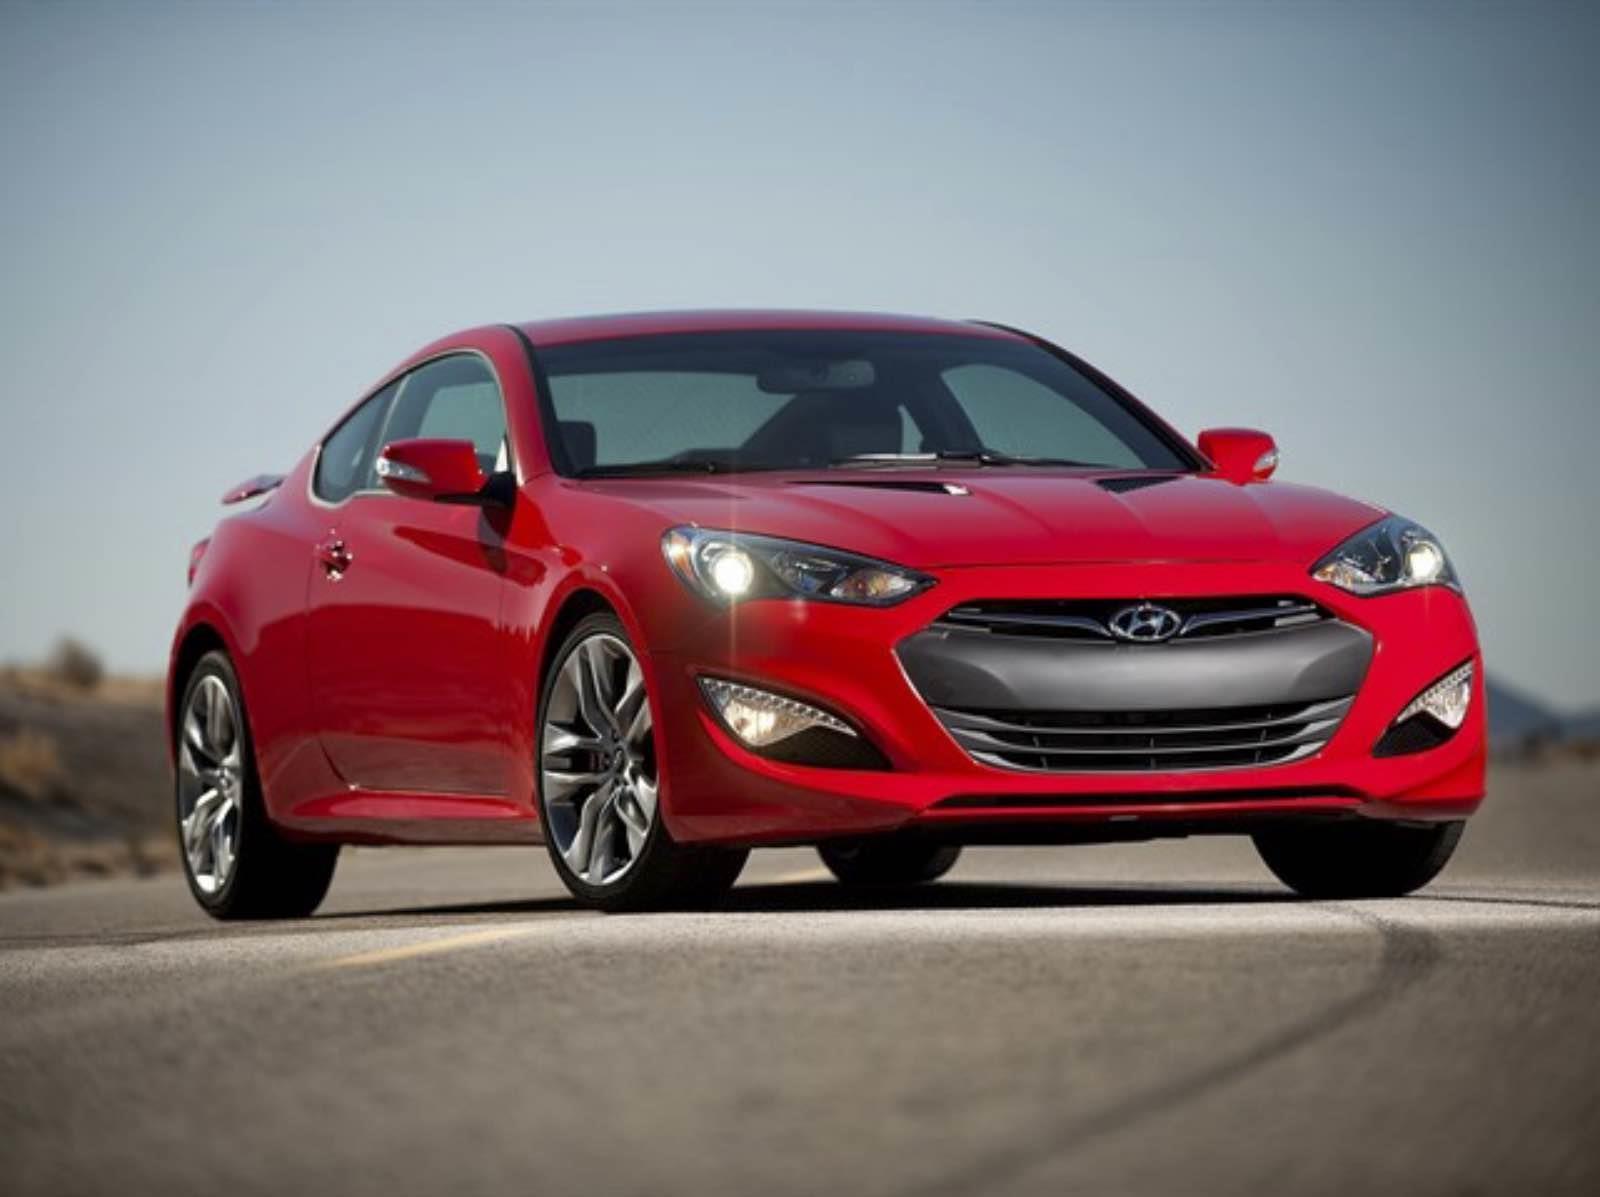 El Hyundai Genesis Coupé dice adiós